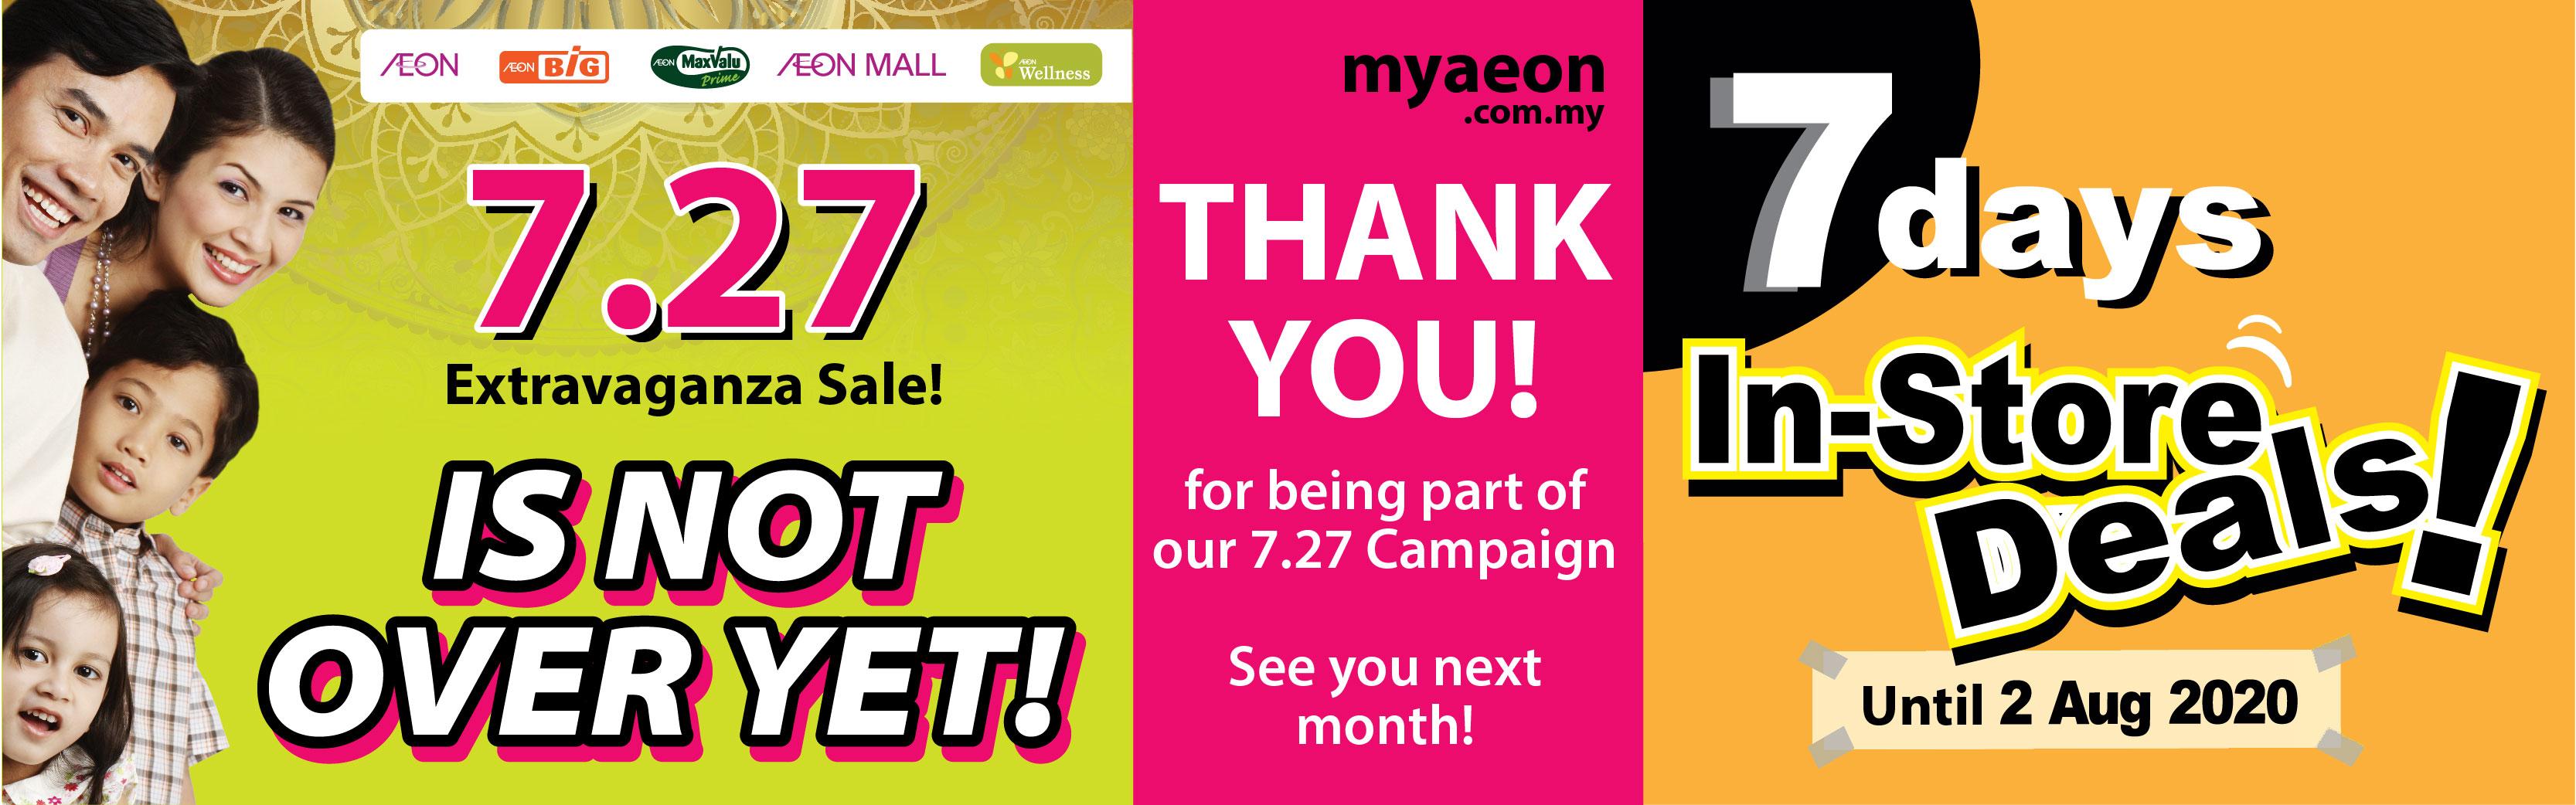 MyAEON will be back